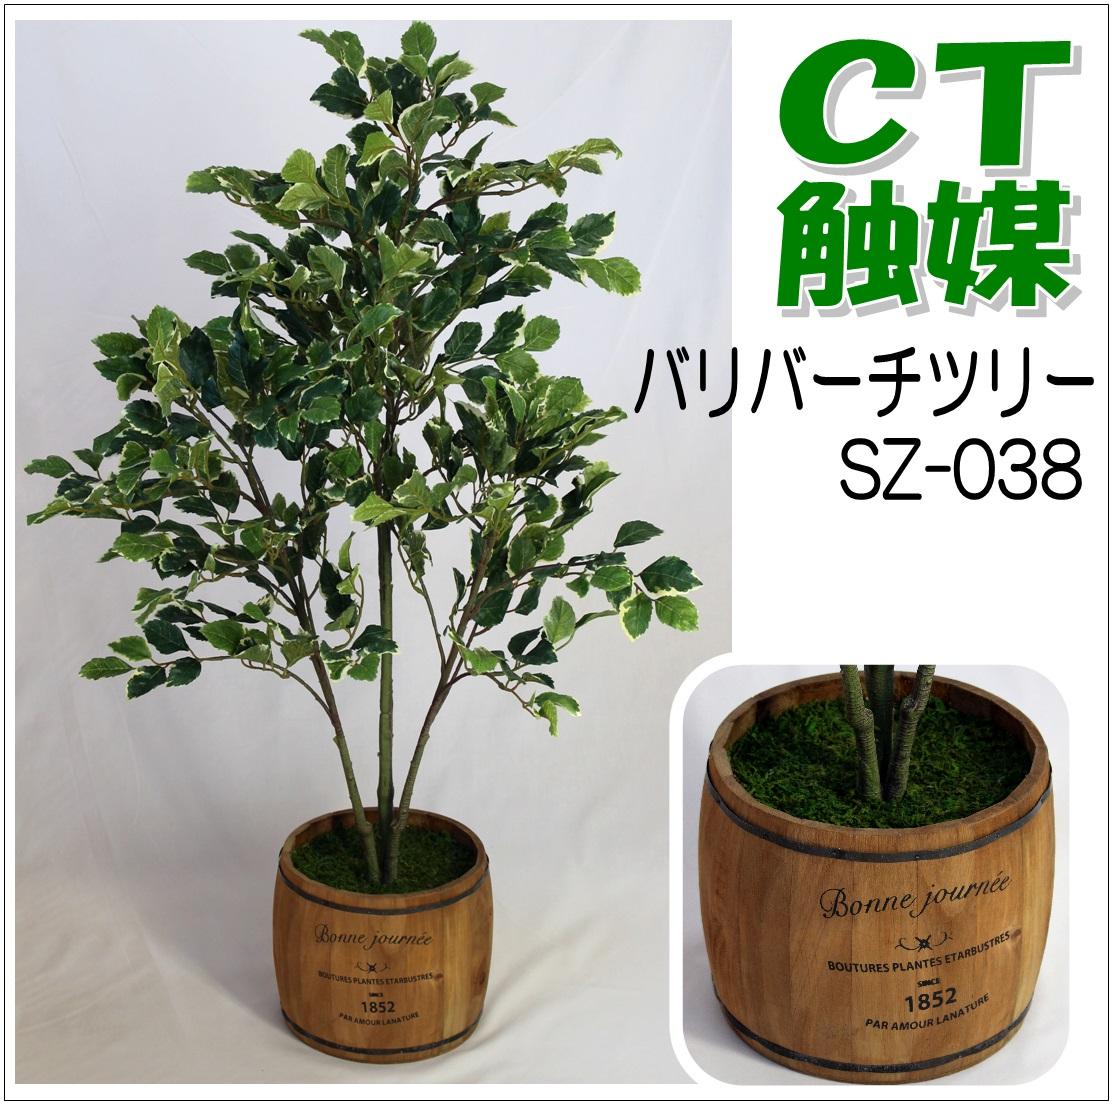 CT触媒 バリバーチツリー sz-038【造花 フェイクグリーン】【日本製】【送料無料】